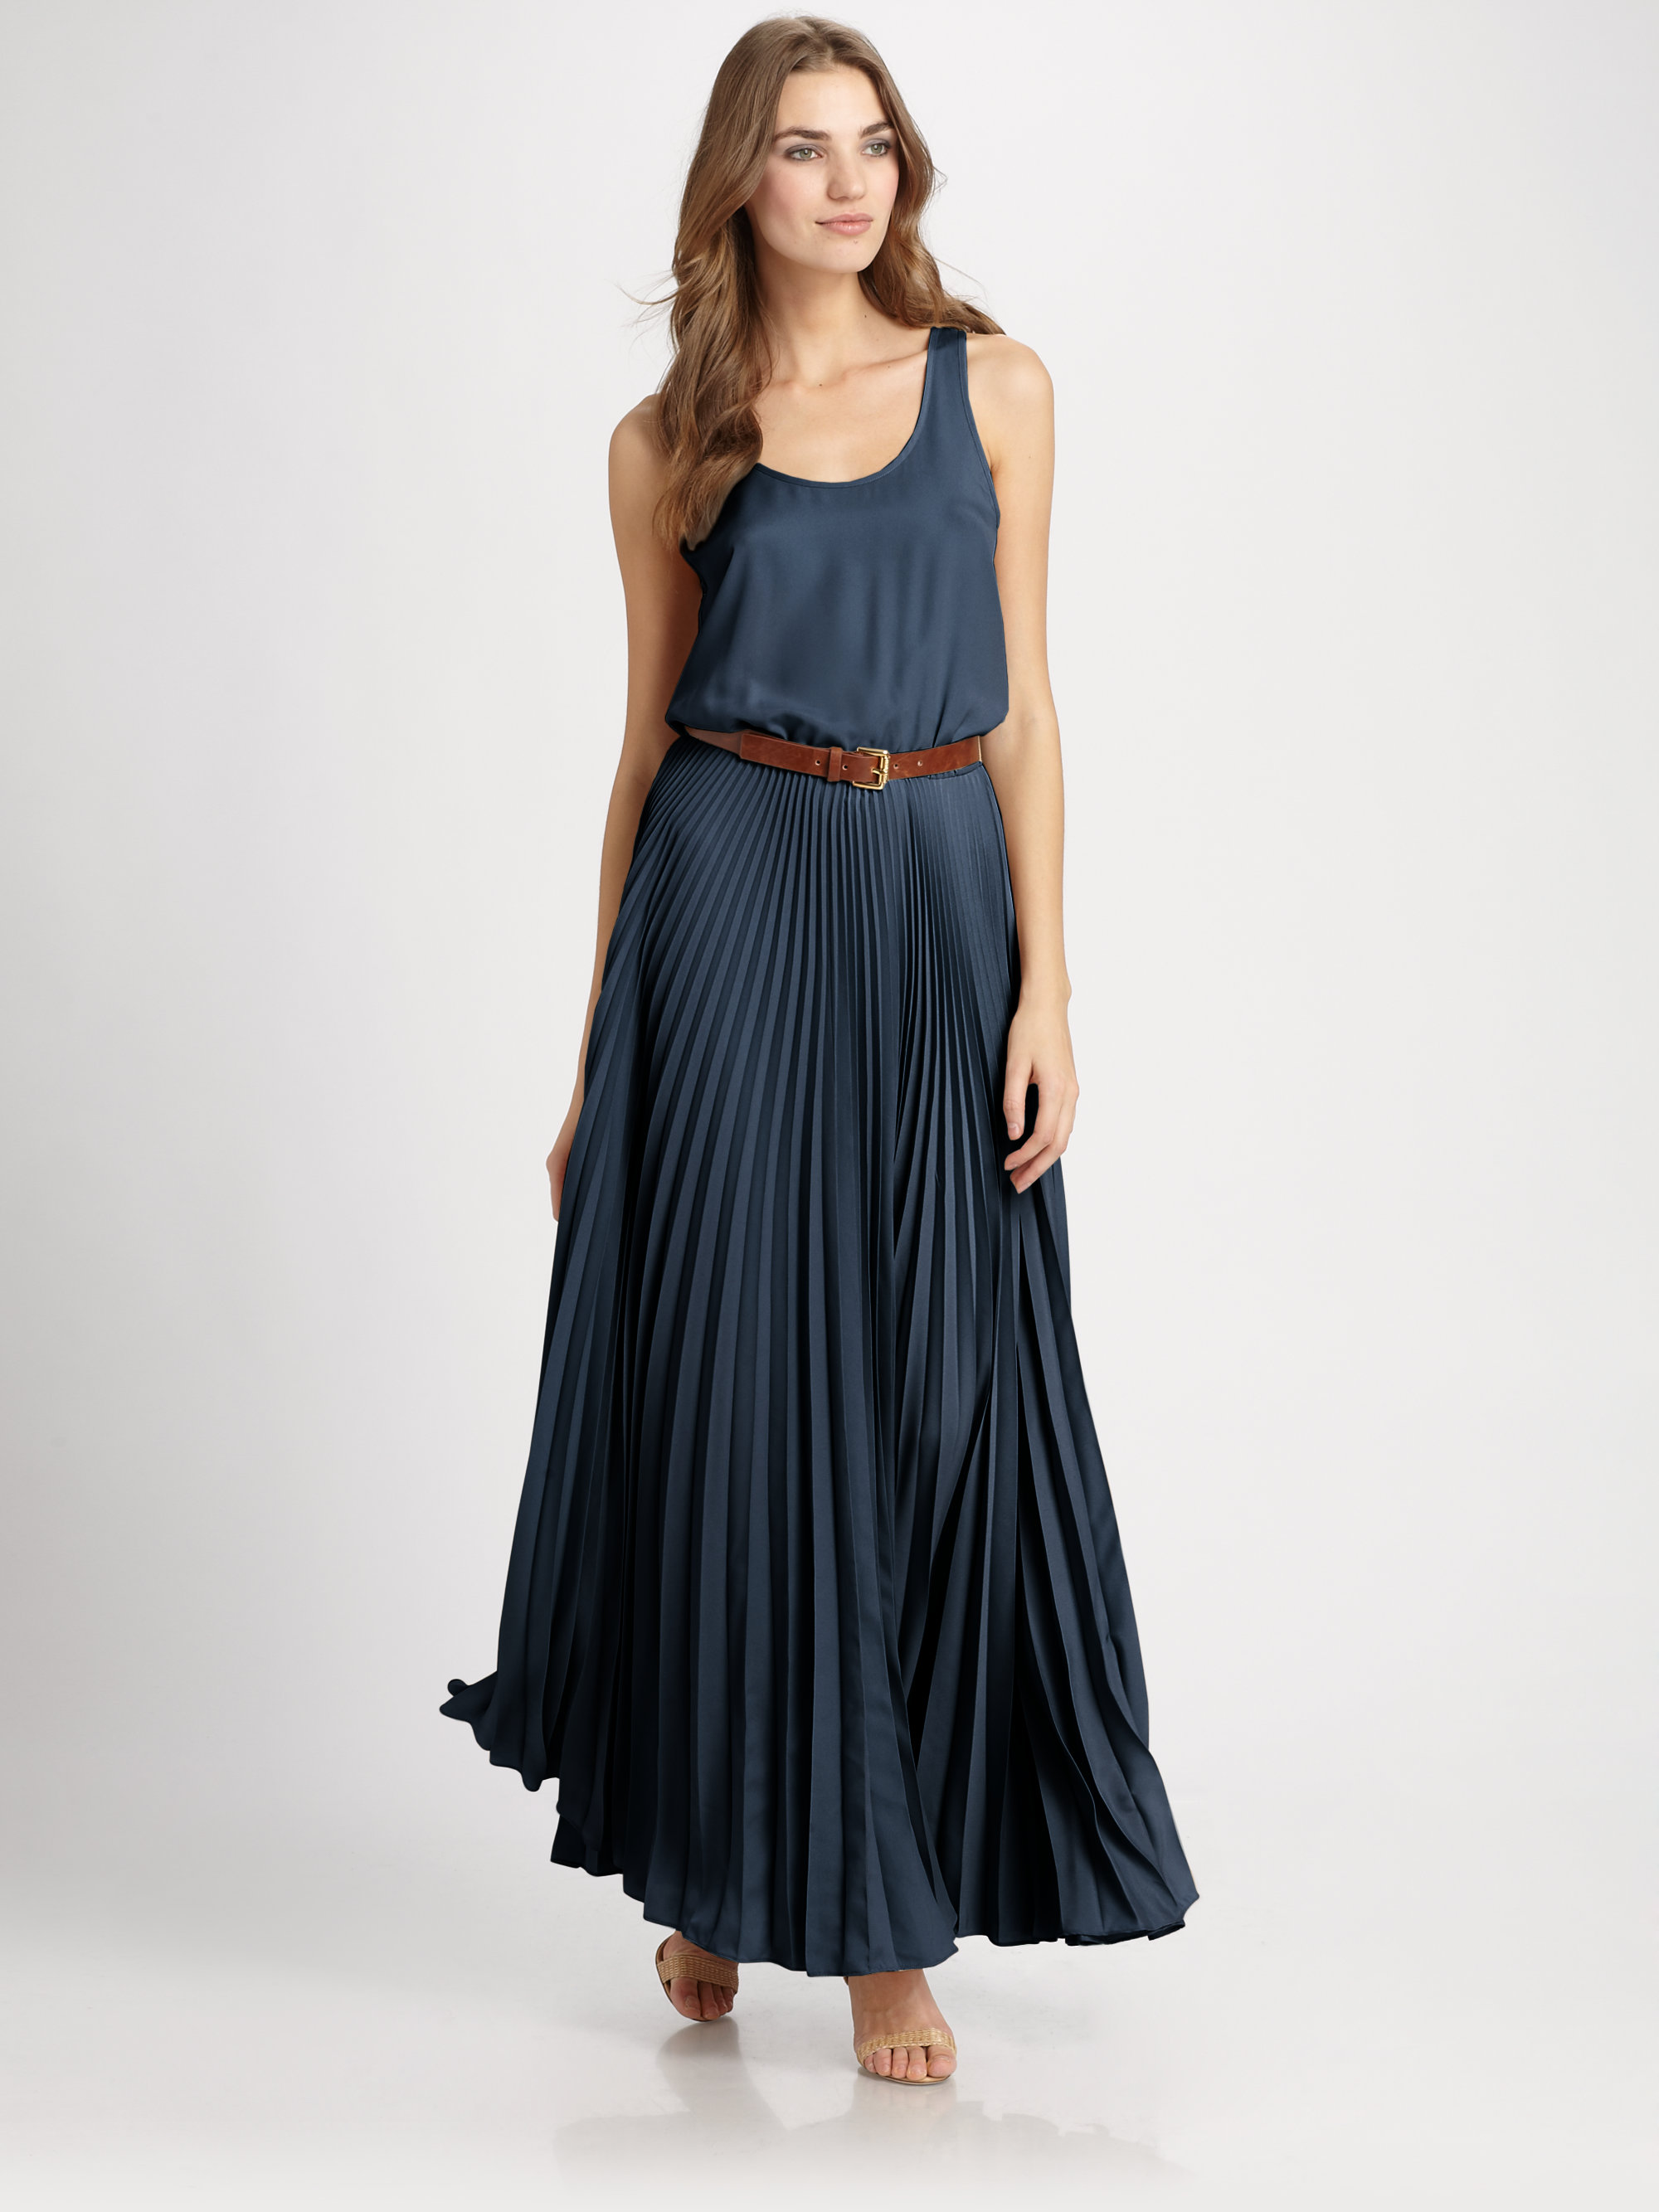 Lyst - Michael Michael Kors Racerback Maxi Dress in Blue